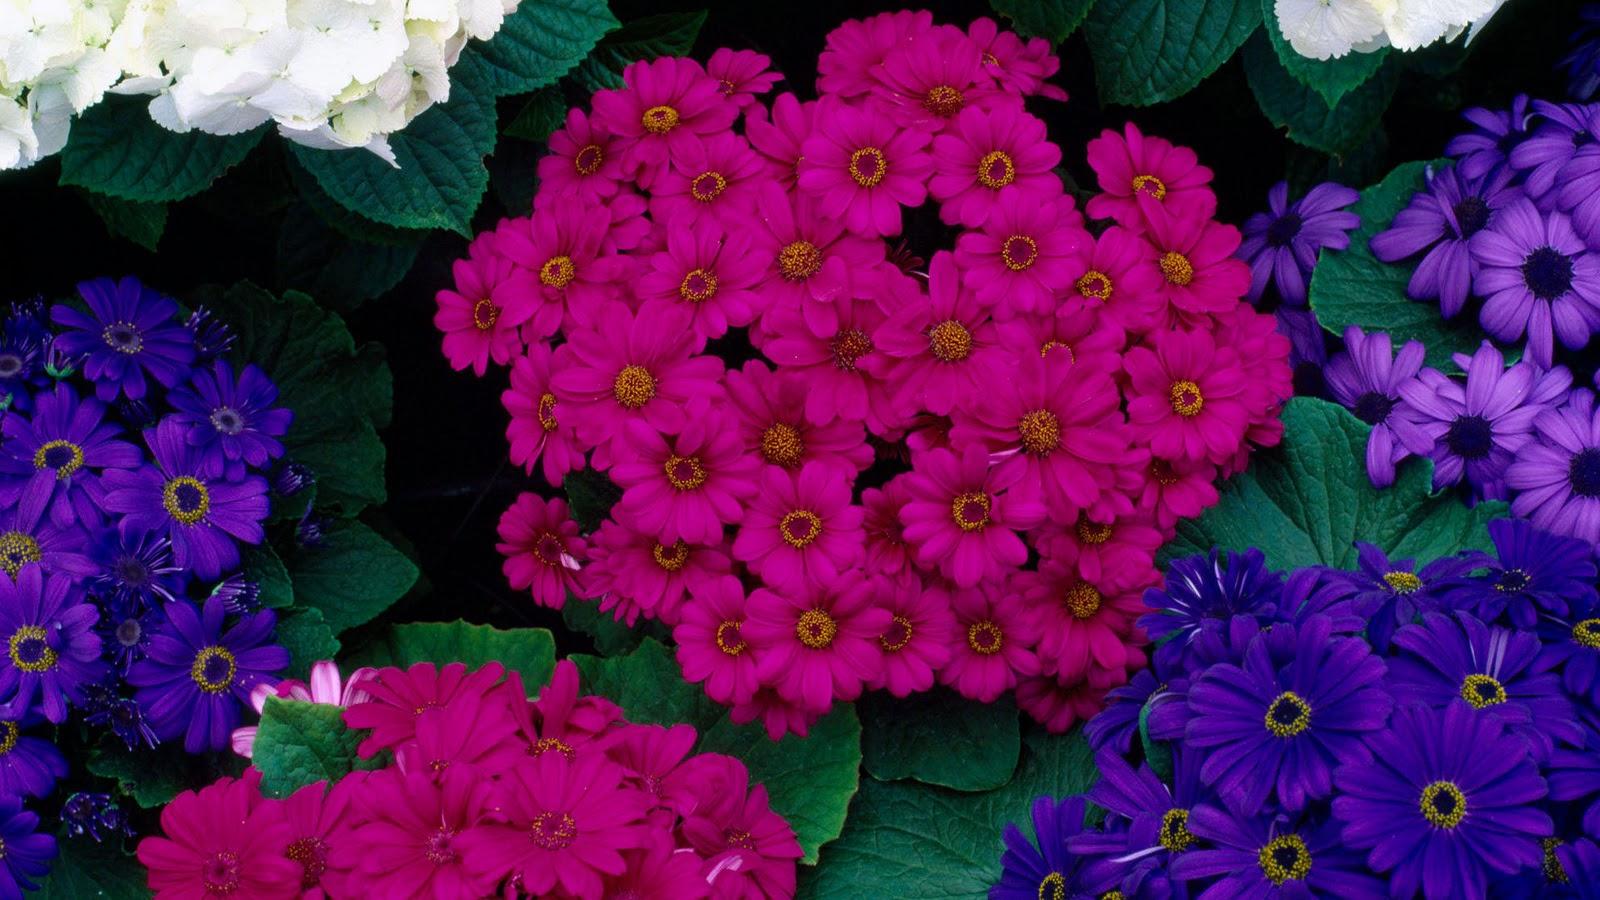 Flowers Wallpapers | HD Wallpapers | Desktop Wallapers | High Definition Wallpapers